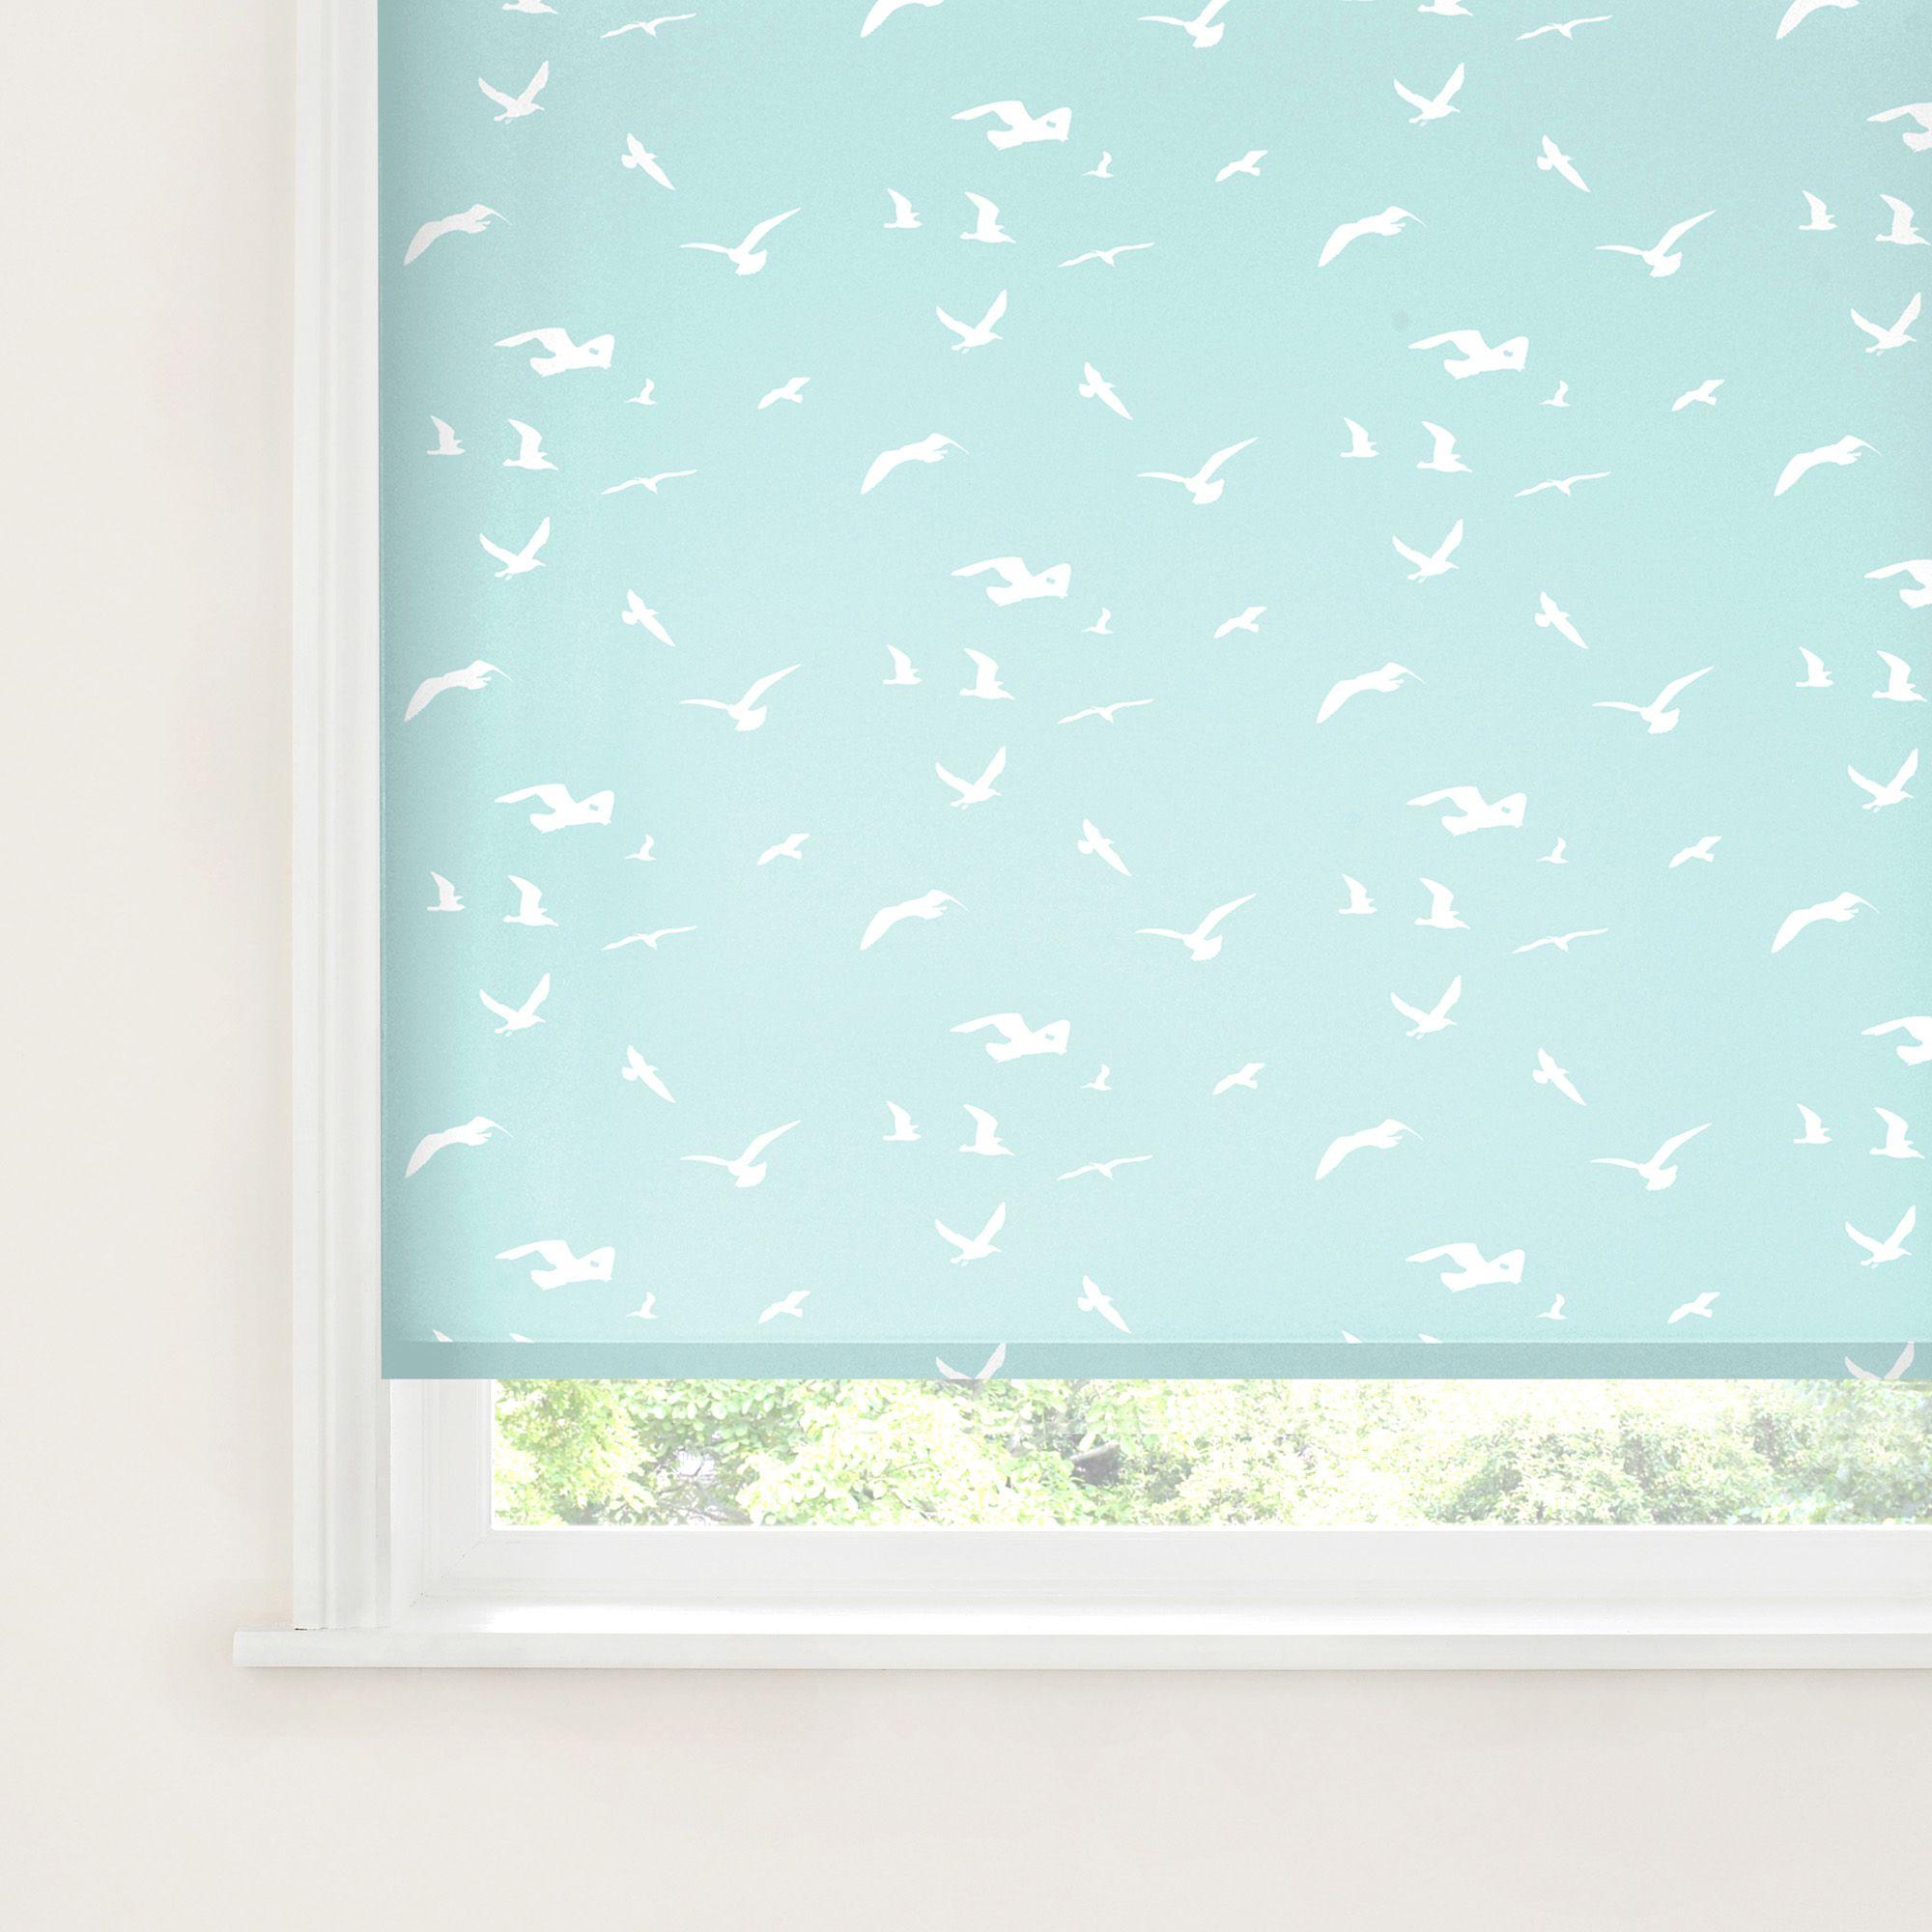 Bathroom Window Blinds B&Q colours malus corded light blue & white roller blind (l)160 cm (w